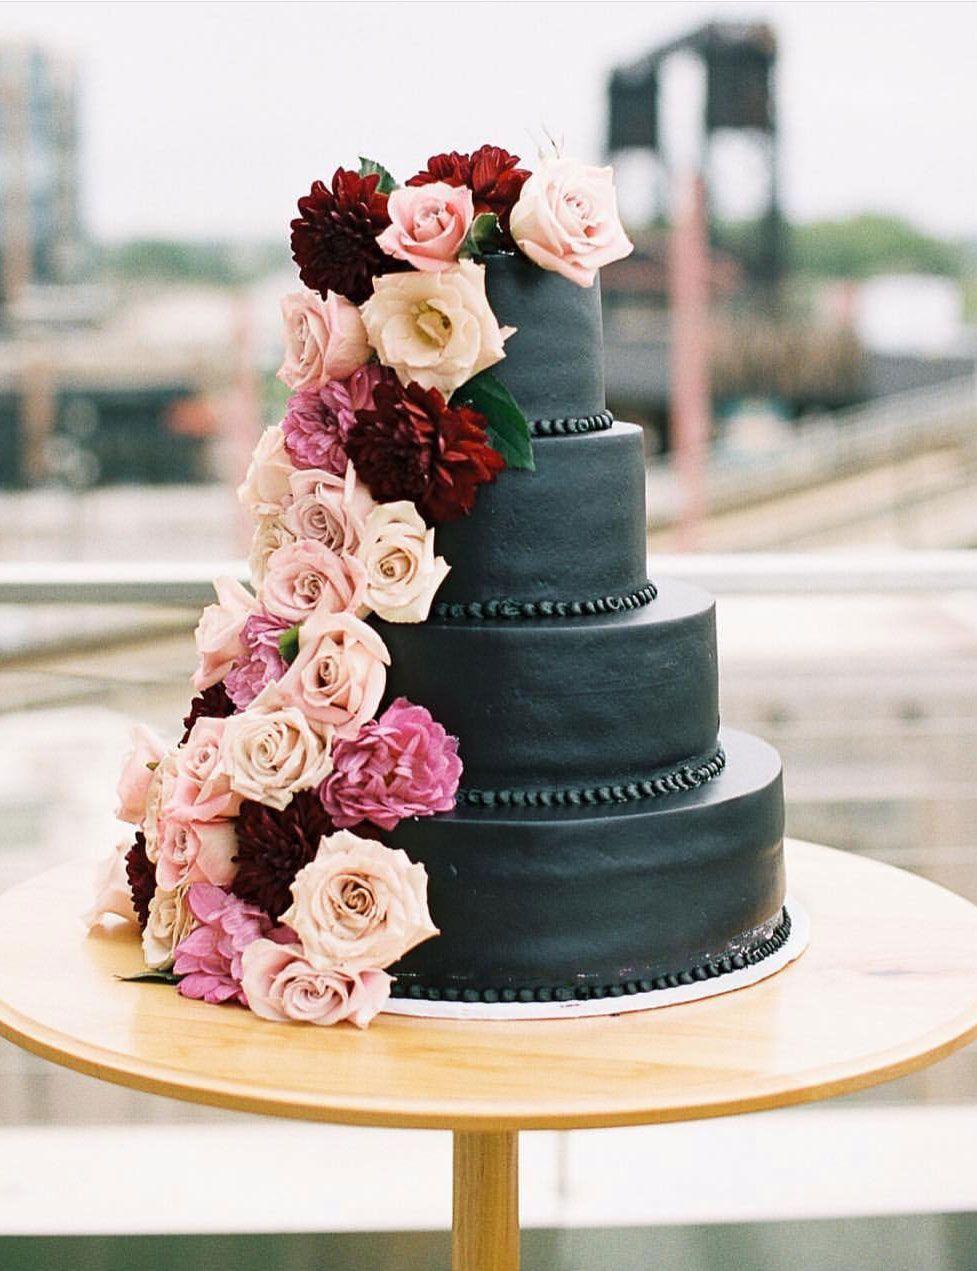 100 Pretty Wedding Cakes To Inspire You - rustic wedding cake ideas, moody wedding cake , naked wedding cake #weddingcake #cake #rusticweddingcake #weddingcakes #nakedweddingcake